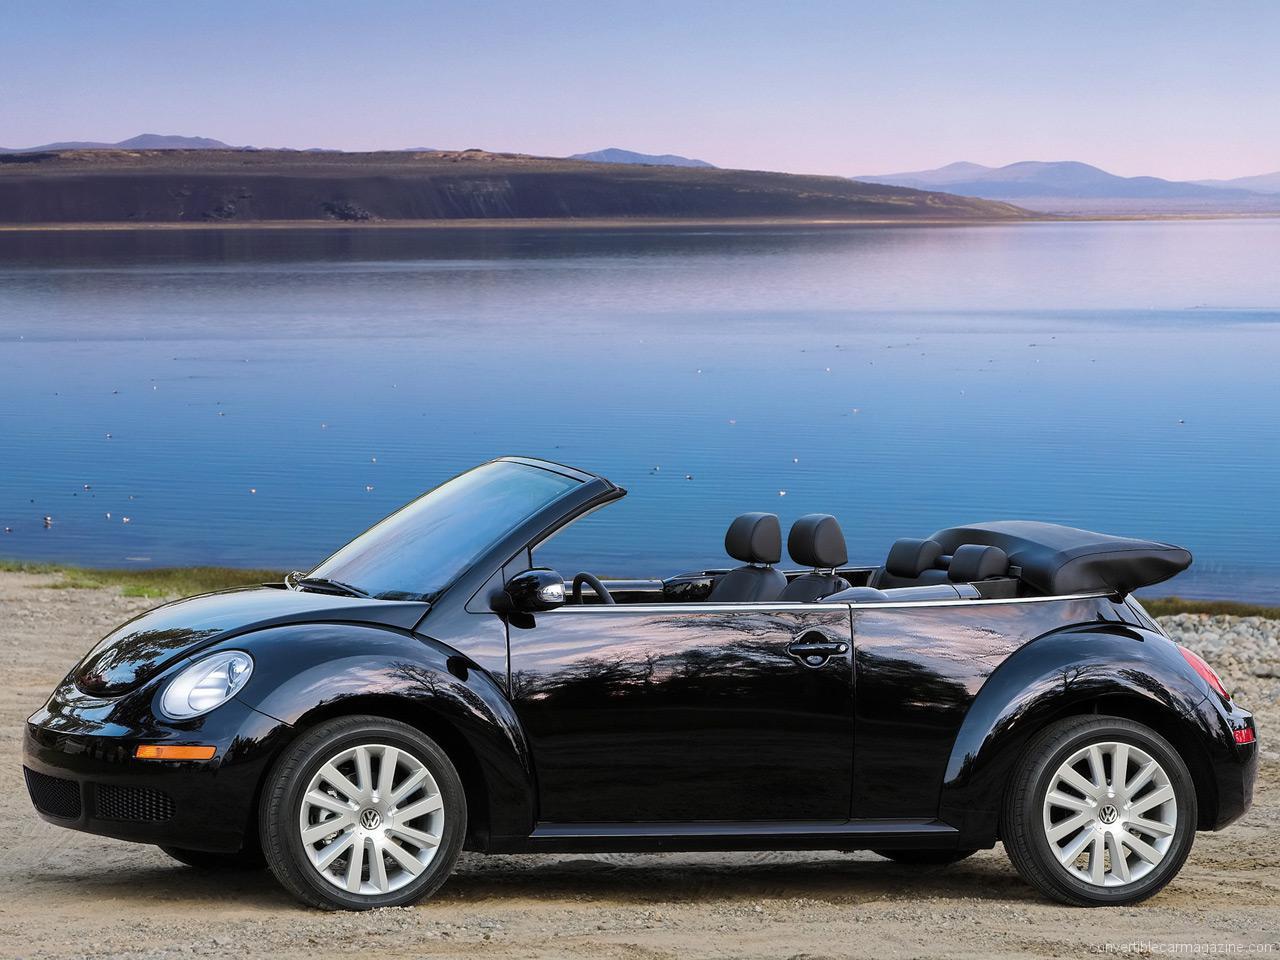 VW 2003 vw bug : Volkswagen Beetle Cabriolet (2003-2011) Buying Guide